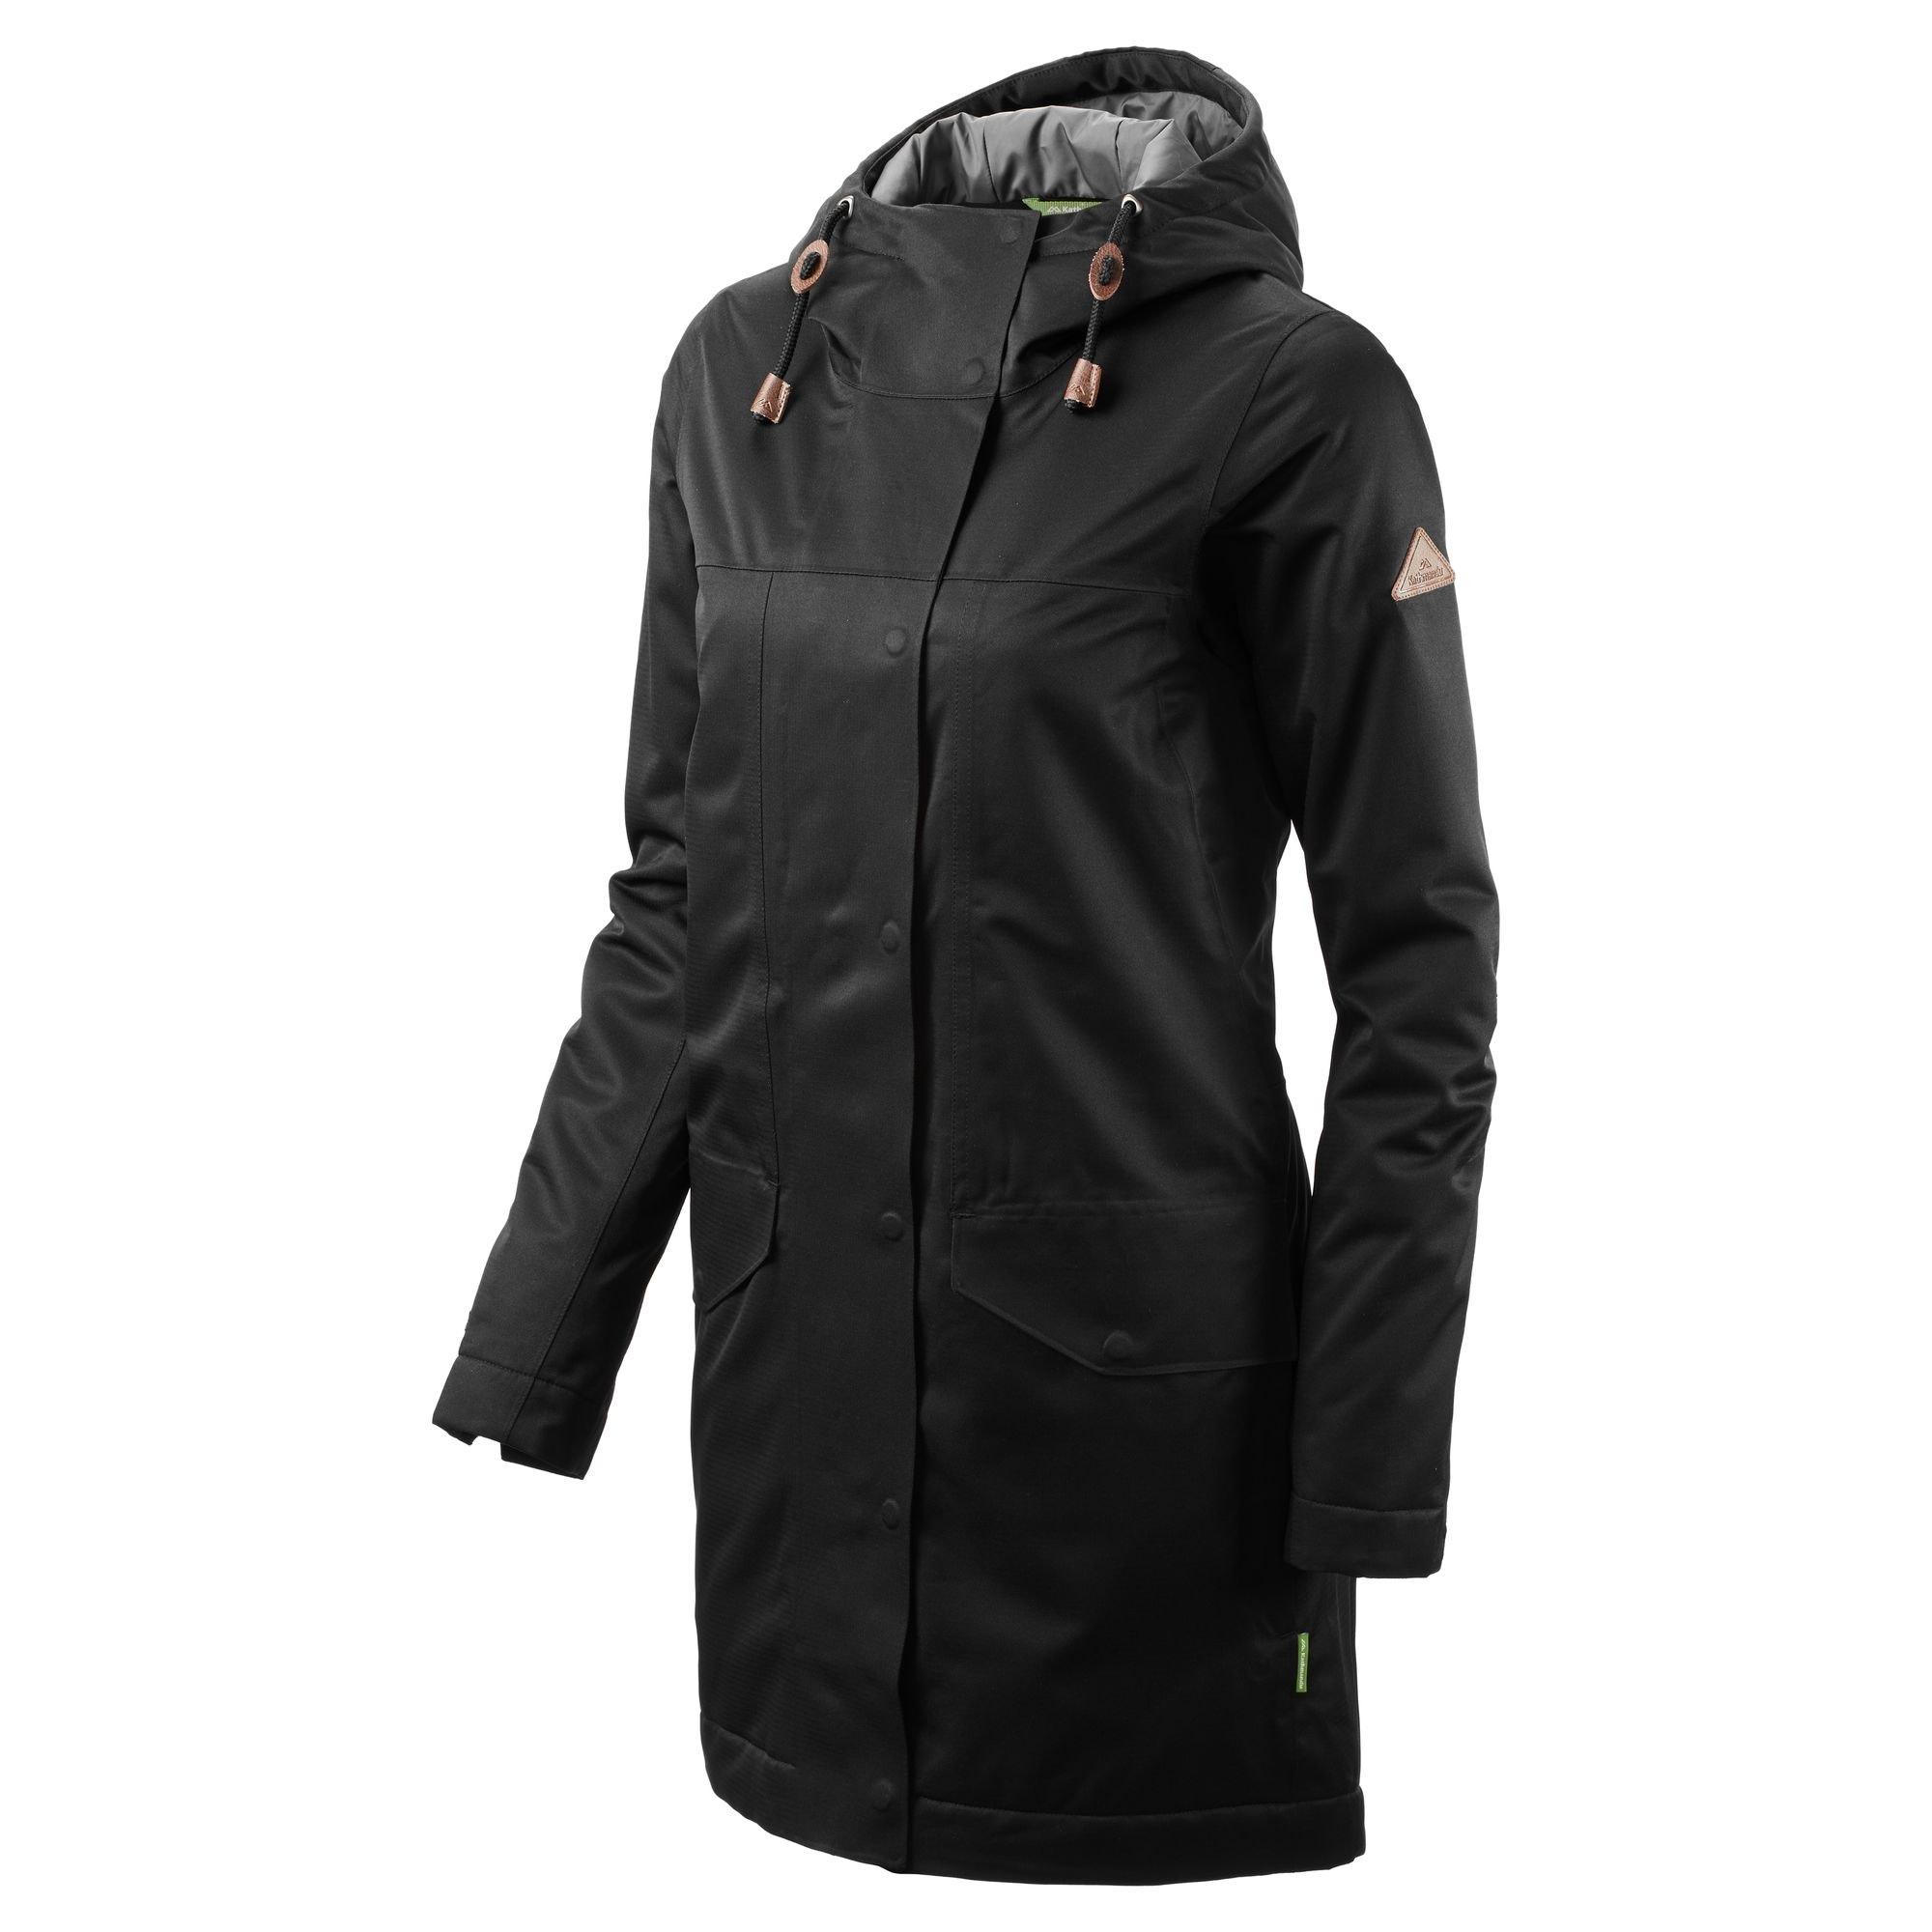 e11730d57 Details about NEW Kathmandu Stockton Waterproof Windproof Insulated Women's  Rain Coat Jacket